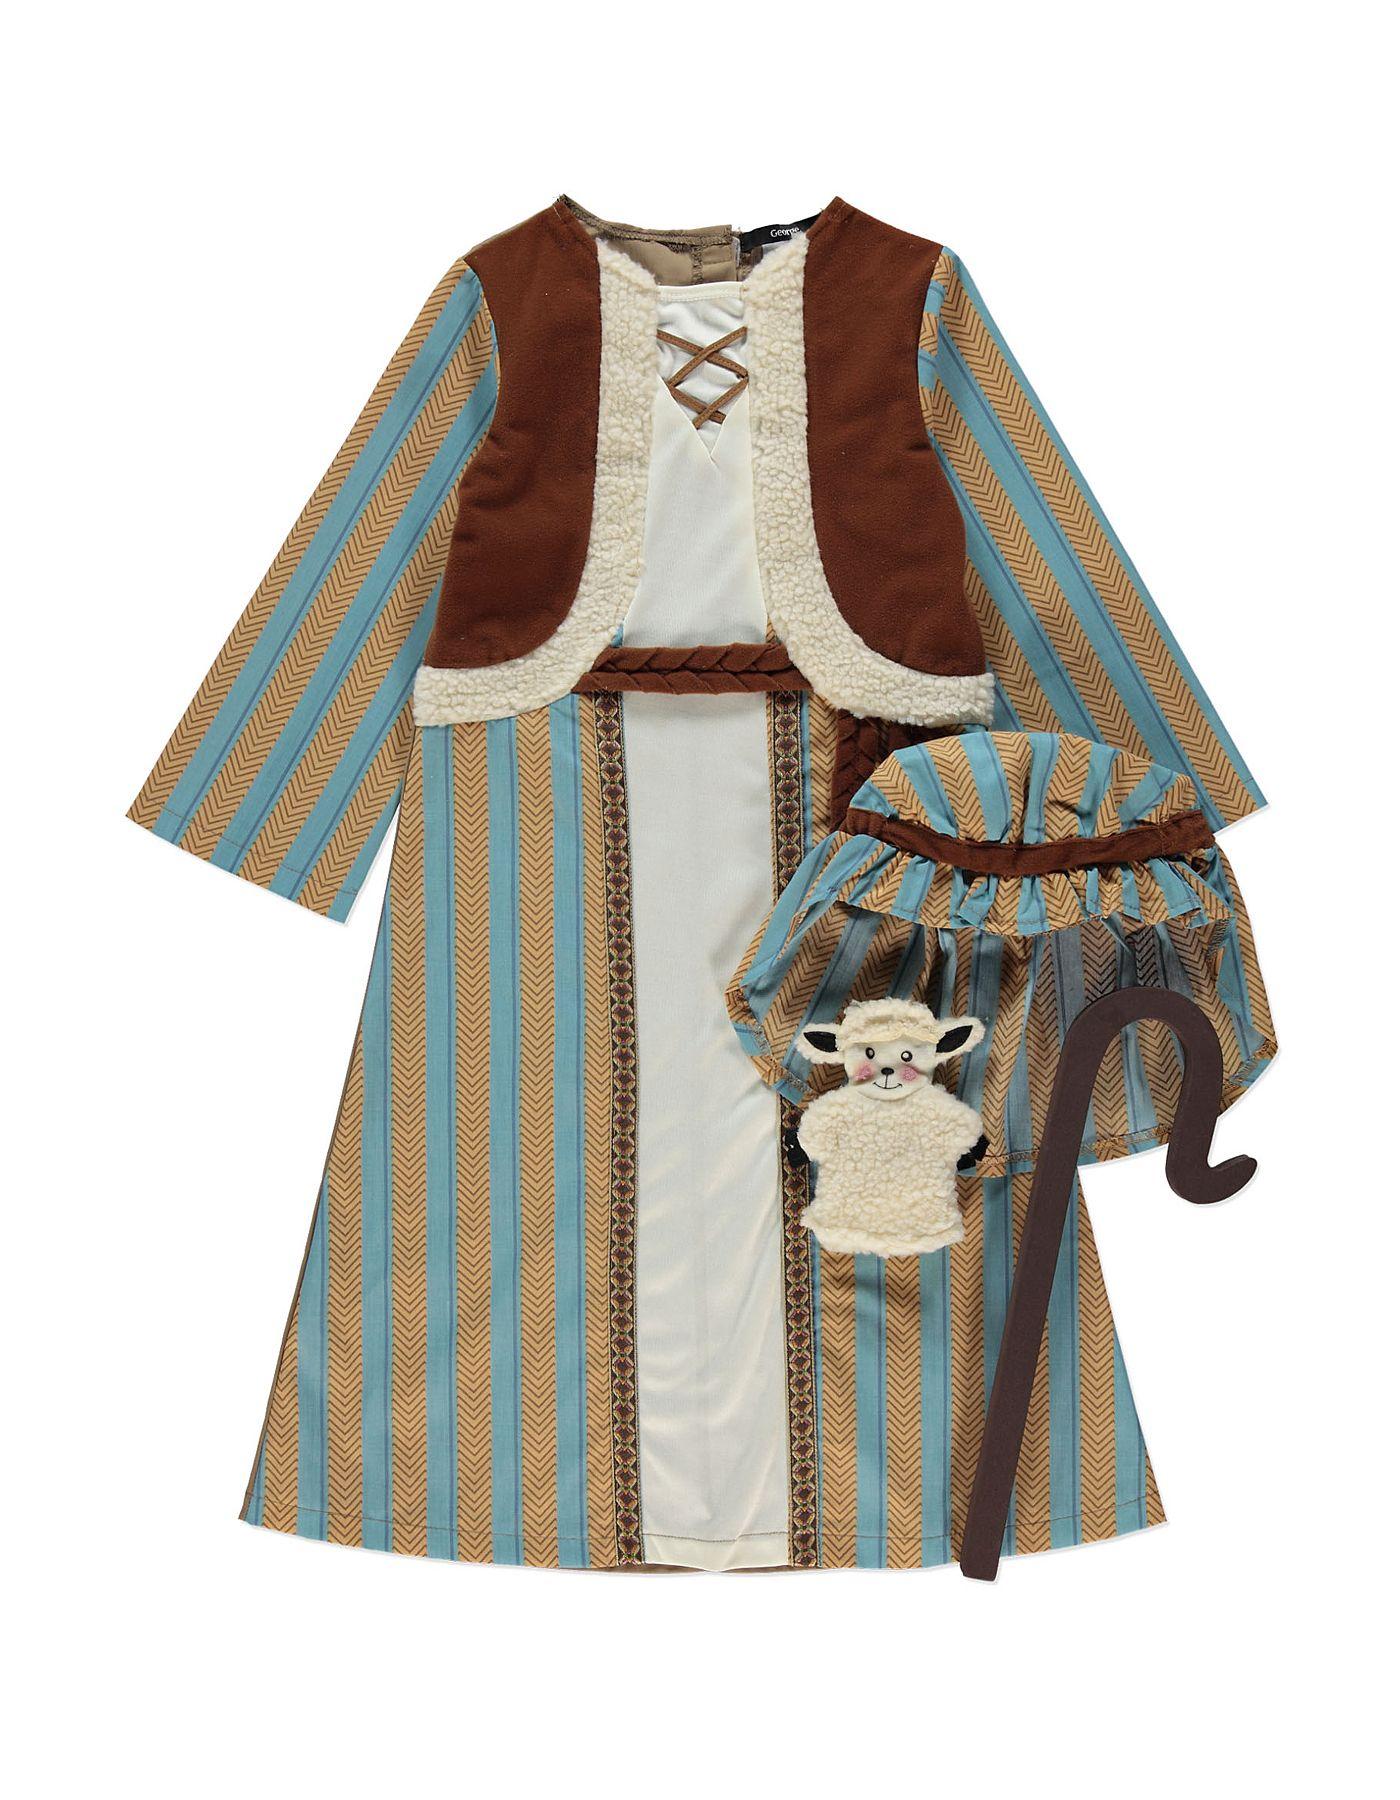 Nativity Shepherd Fancy Dress Costume Boys George At Asda Fantasias Roupas De Epoca Roupas